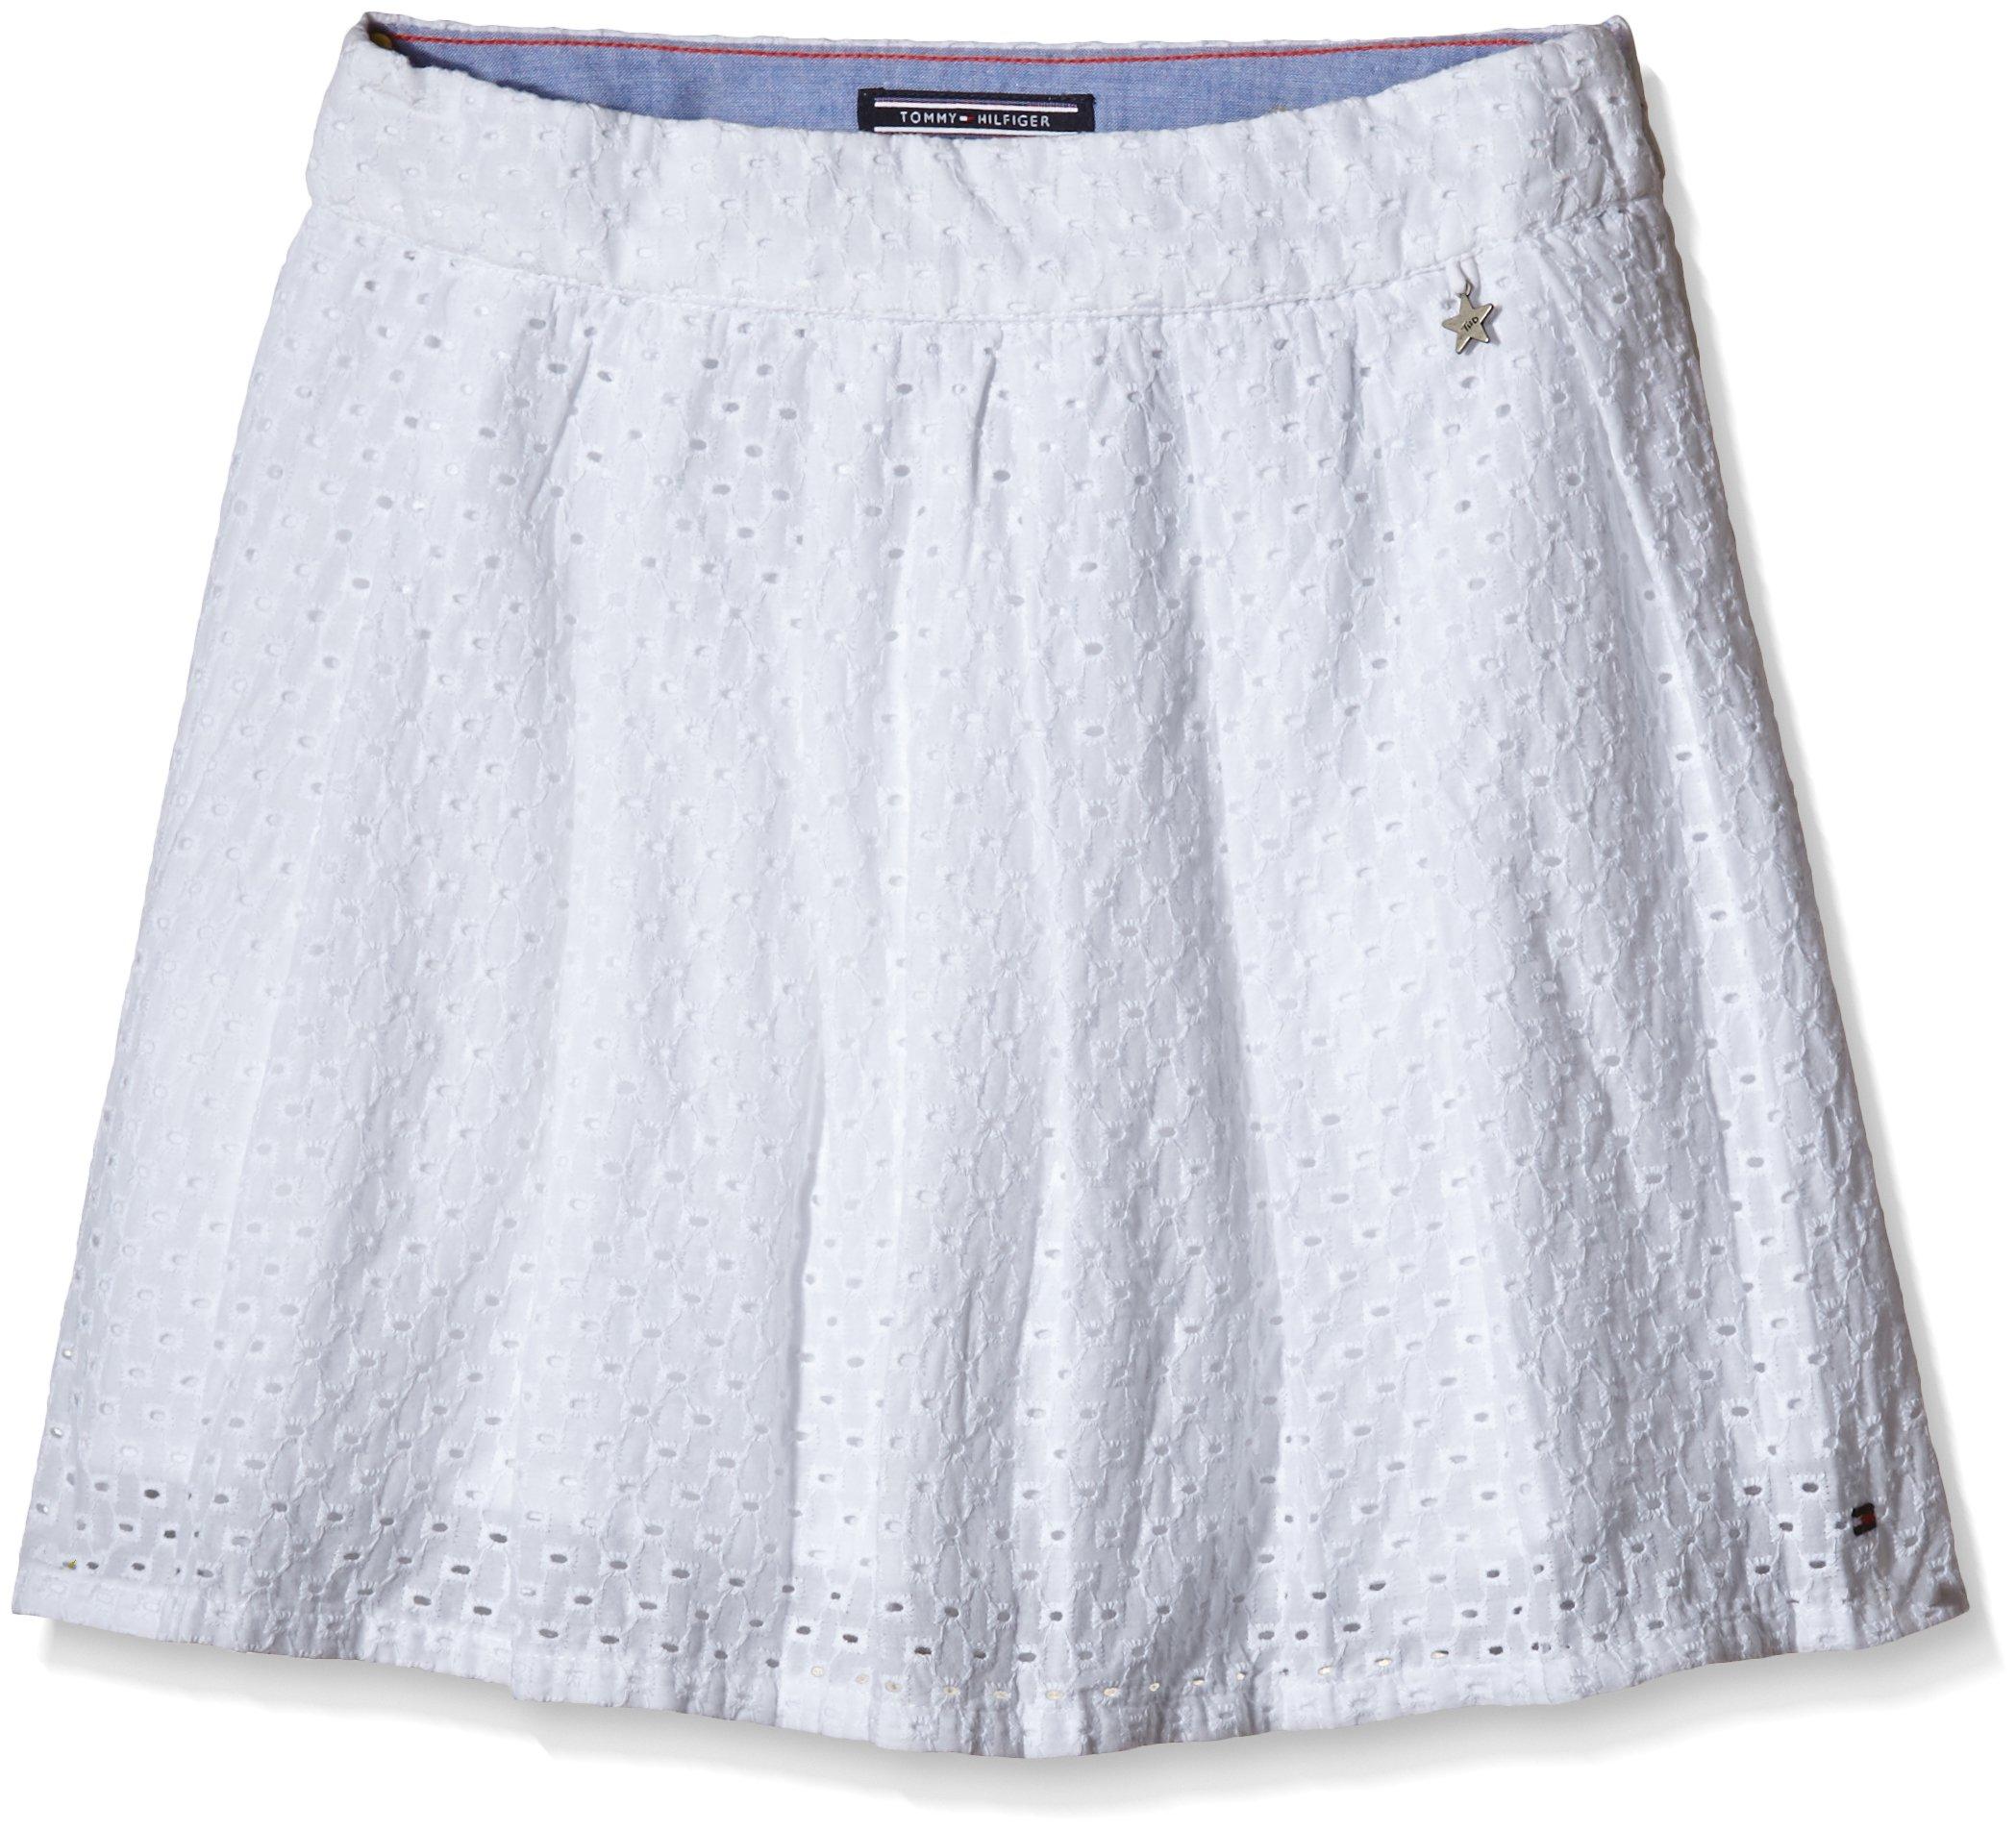 Tommy Hilfiger Florence Skirt – Falda Niños